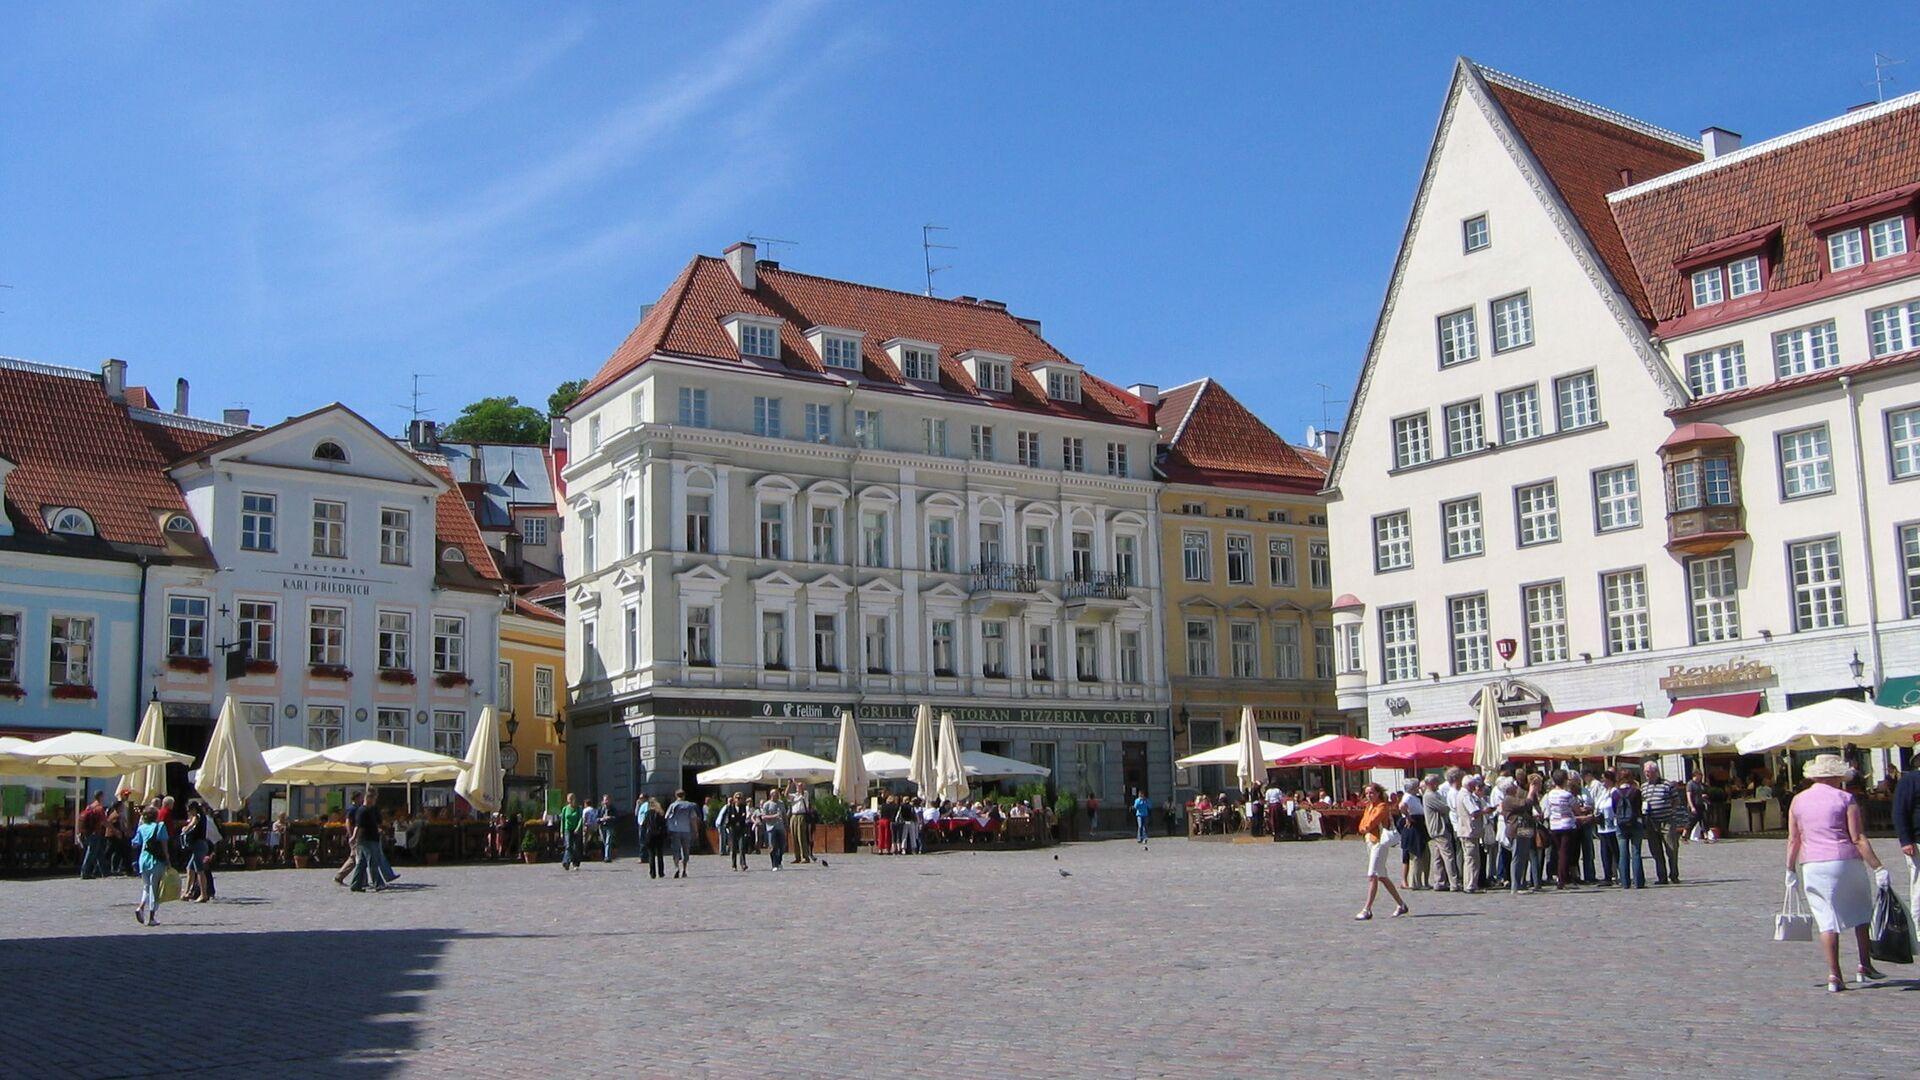 Tallinn, Estonsko - Sputnik Česká republika, 1920, 15.07.2021